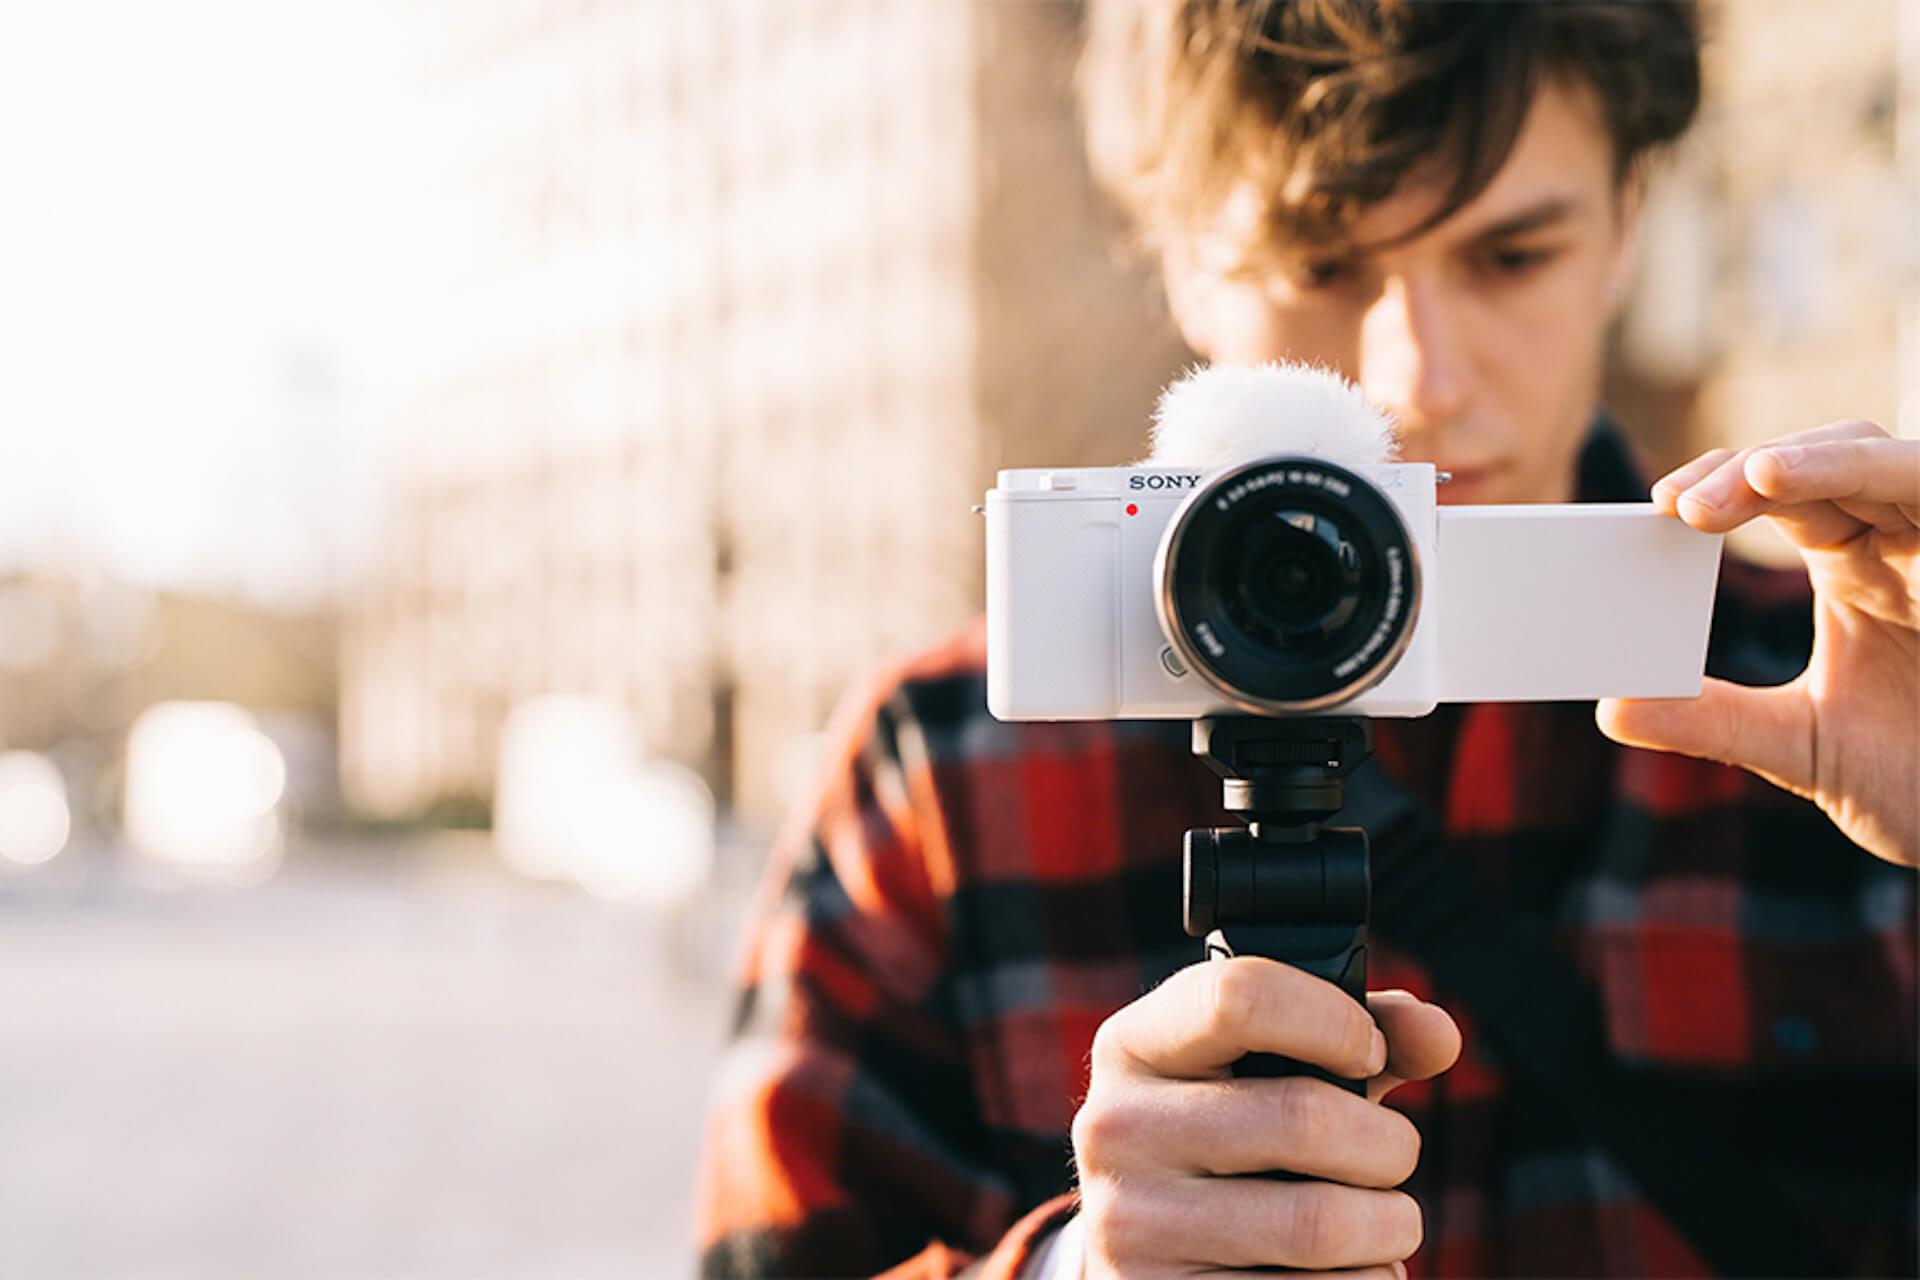 SONYからVlog撮影に特化したαTMシリーズ初のレンズ交換式カメラ「VLOGCAMTM ZV-E10」が発売! tech_210729_sonyvlogcam1